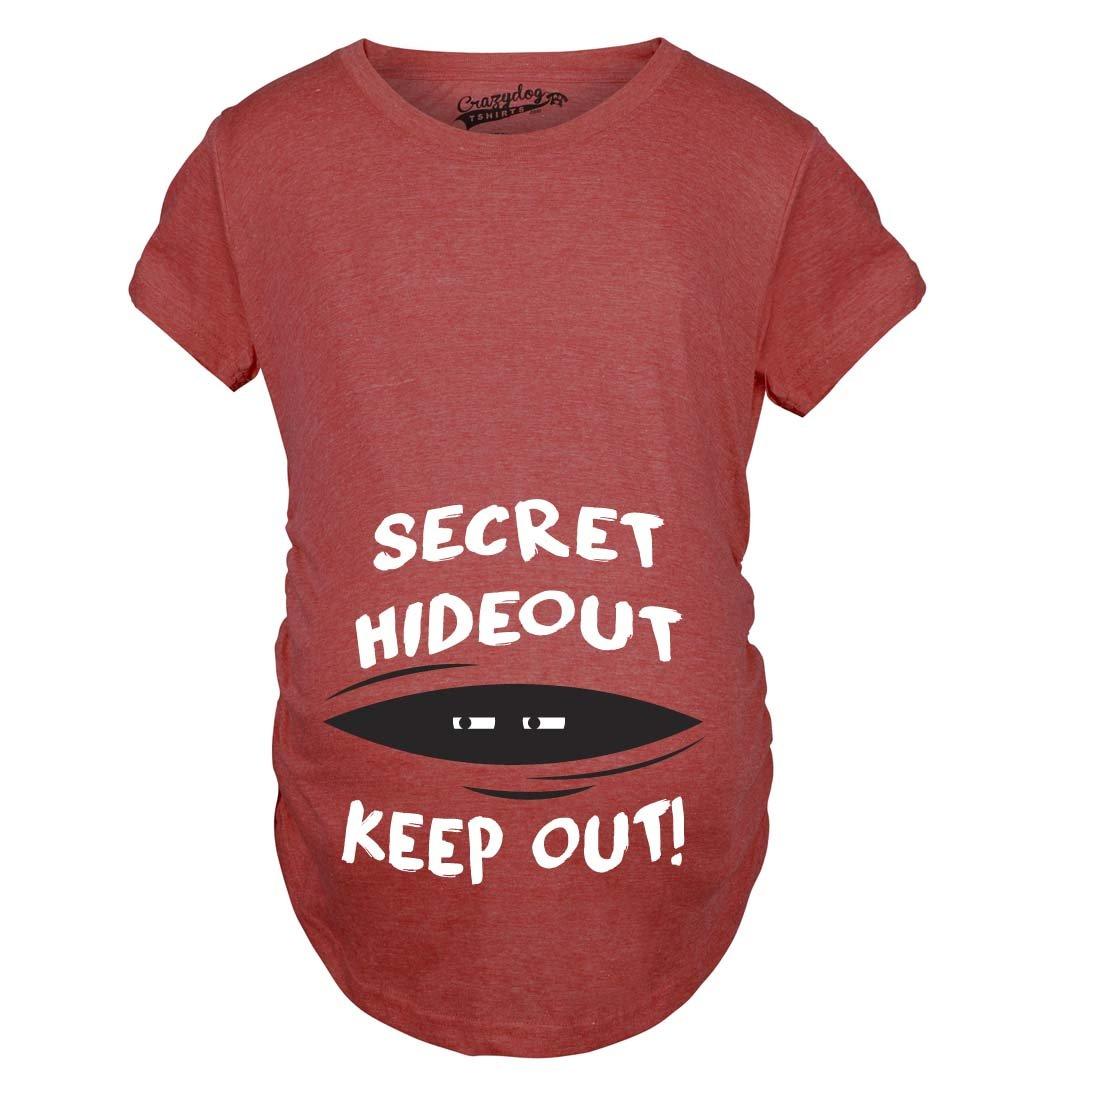 Maternity Secret Hideout Baby Peeking Maternity Shirt Funny Pregnancy Shirts Crazy Dog Tshirts 015SecretHideMAT